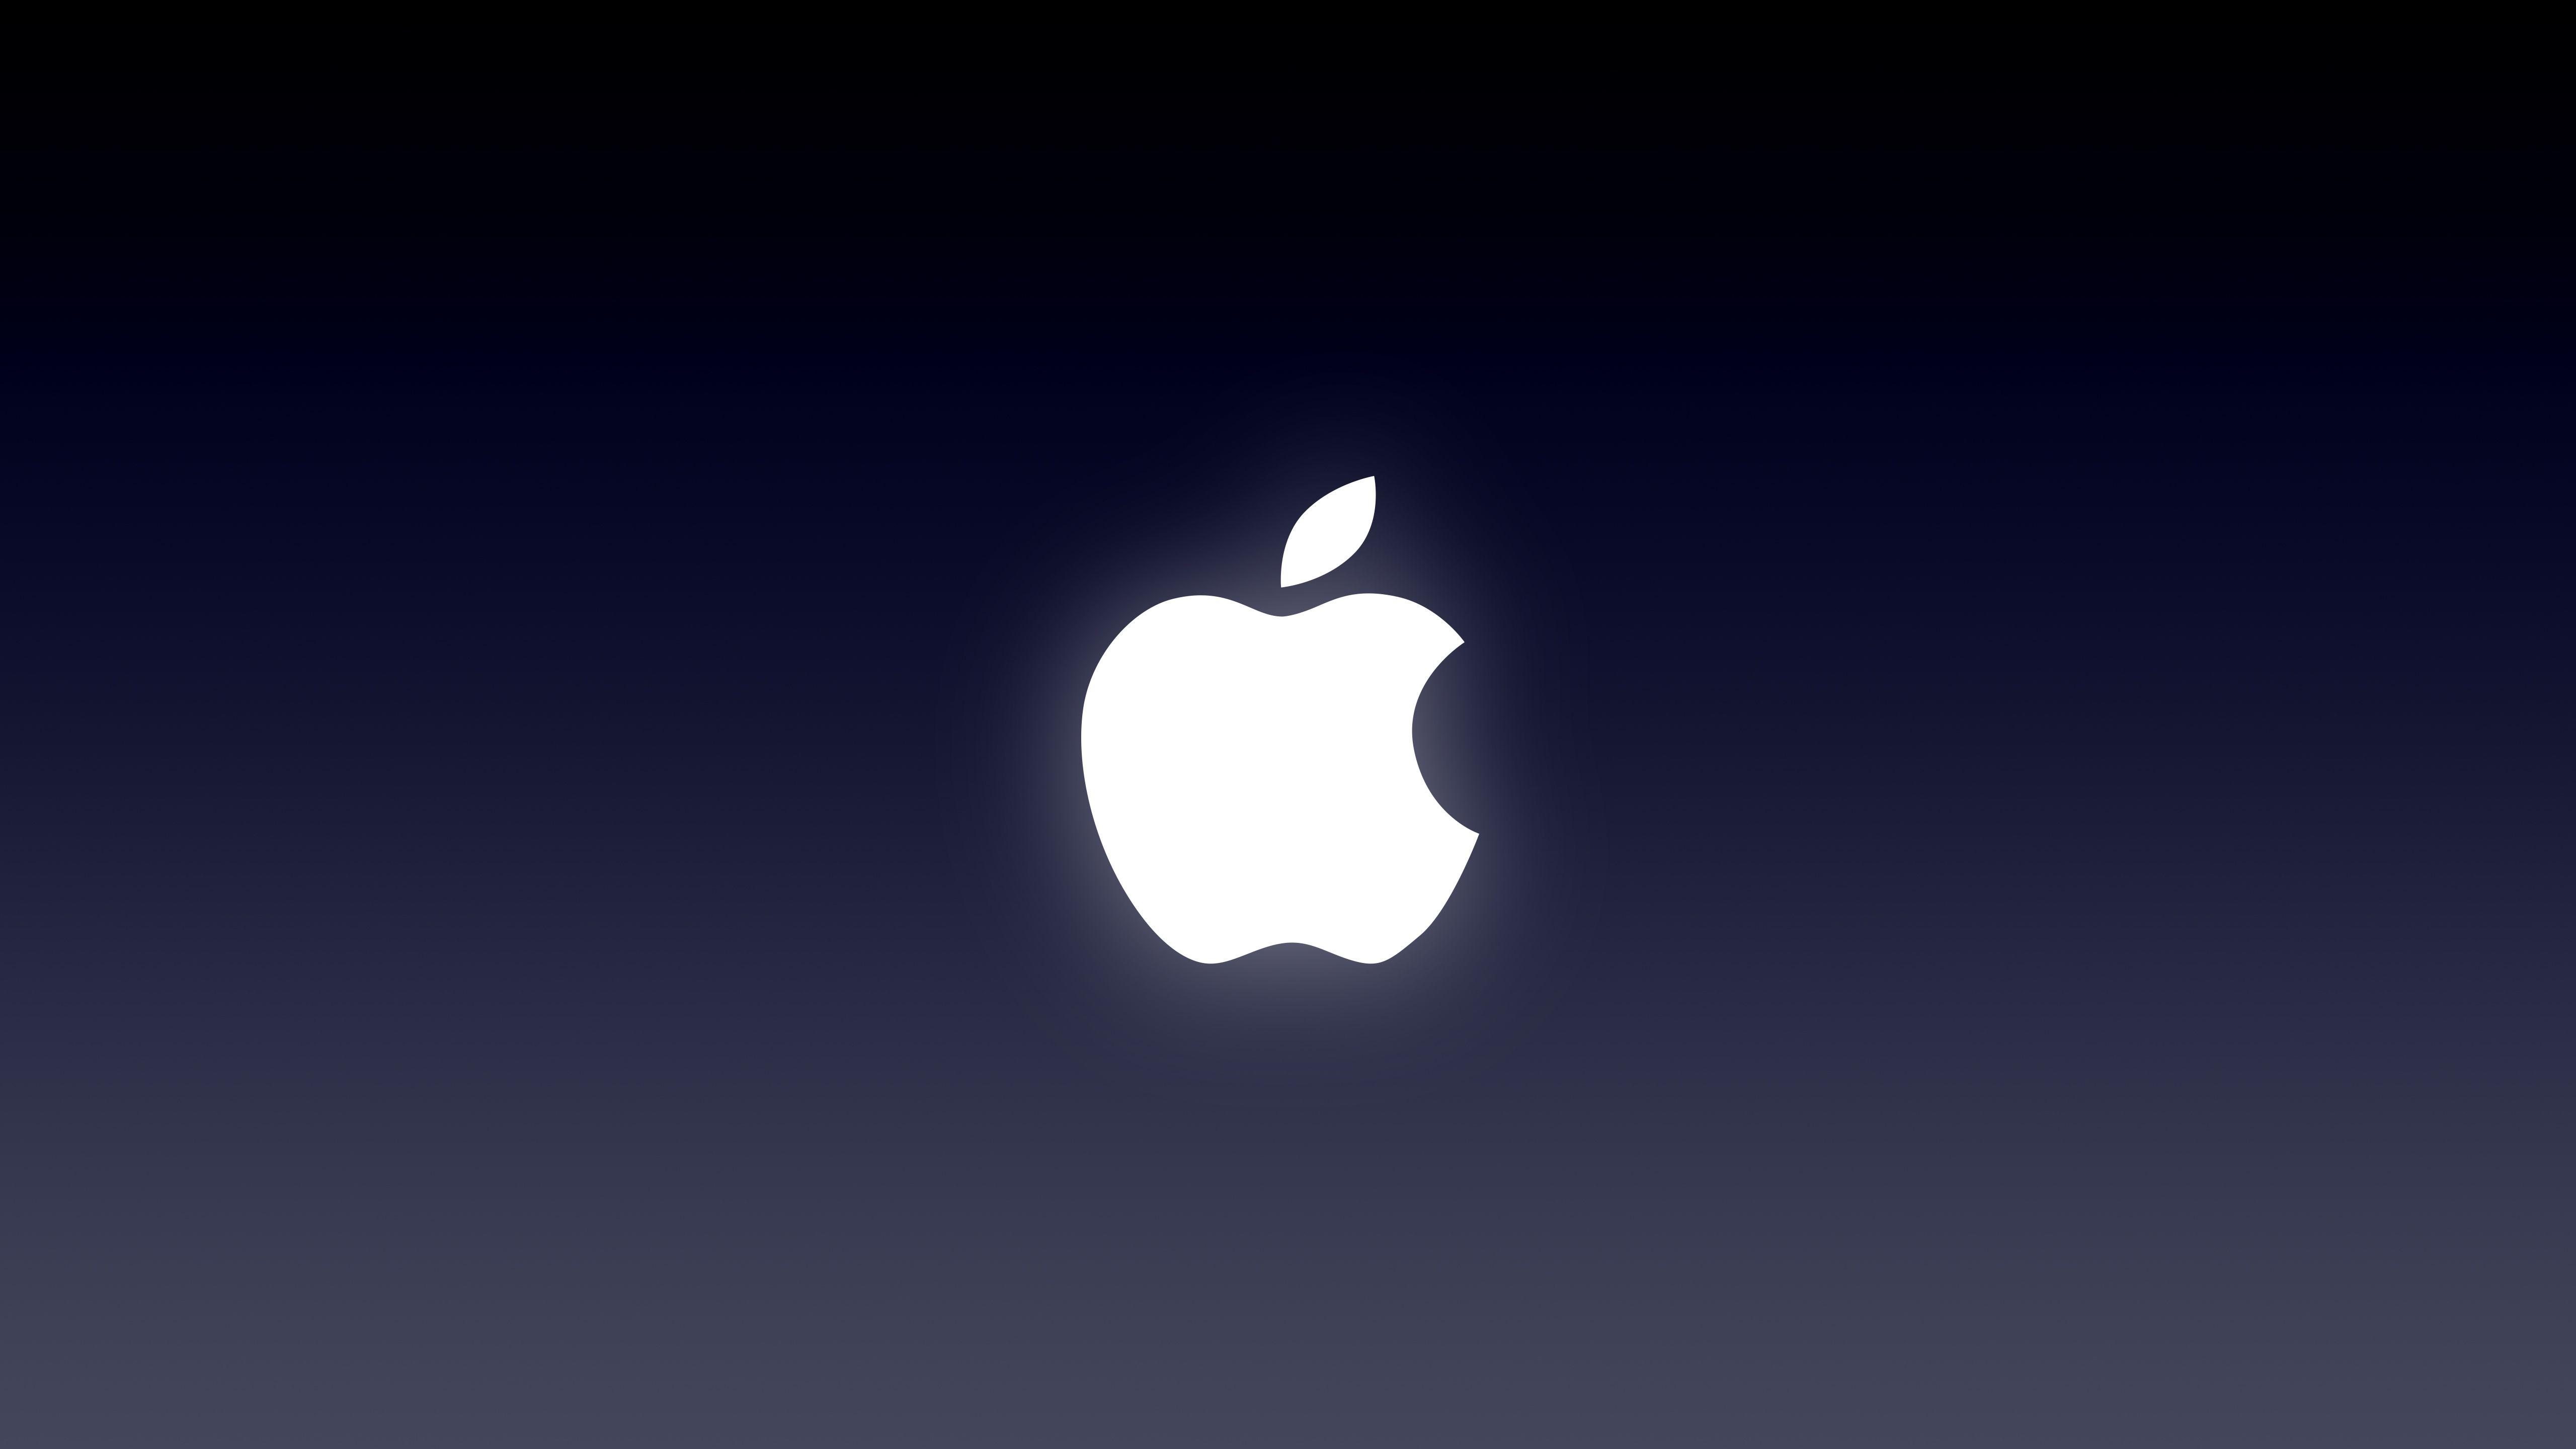 Apple keynote presentation background 5120 x 2880 pixels 5K